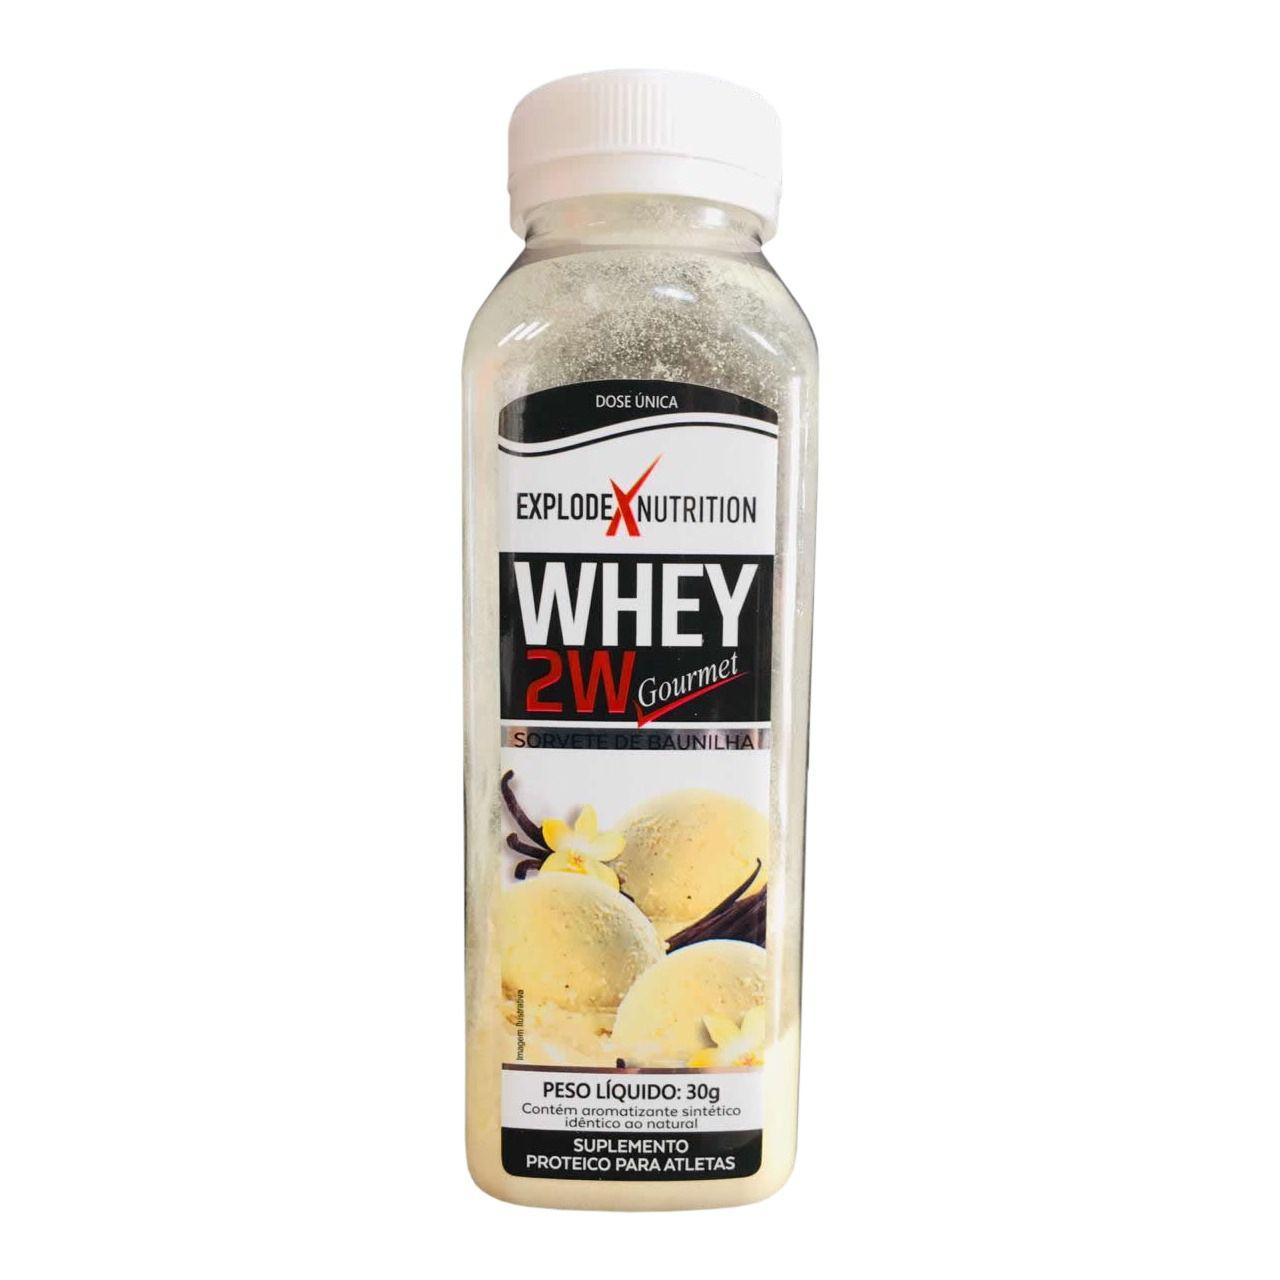 Whey 2W Gourmet Explode Nutrition - 30g (1 dose)